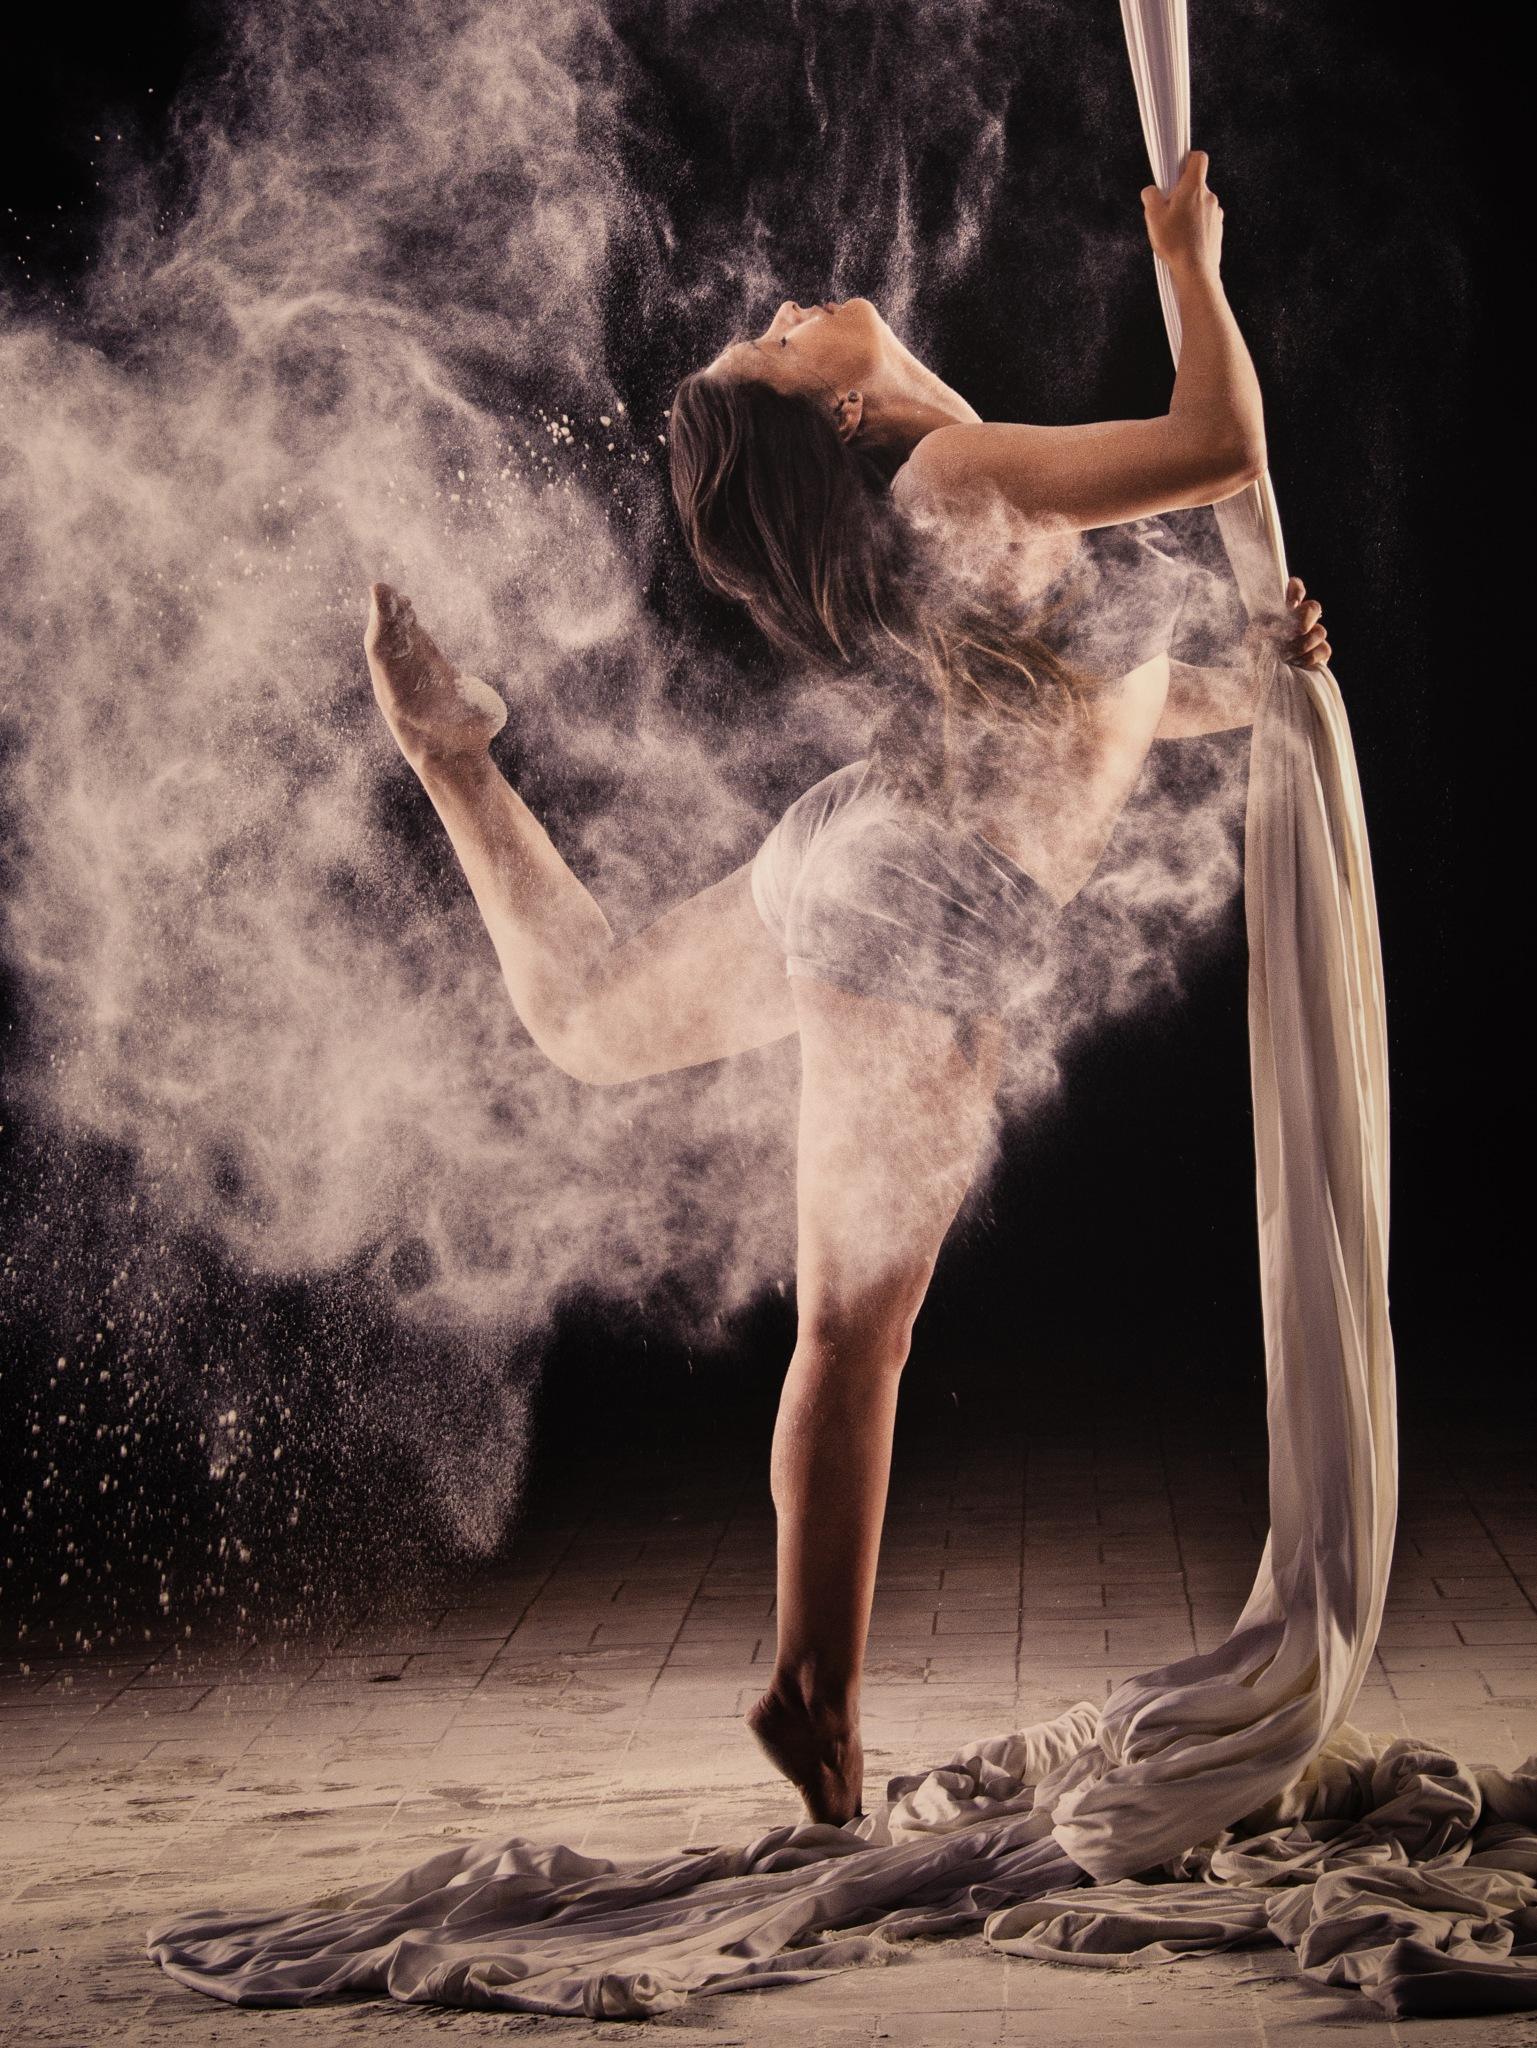 Acrobatics by Y-Photography